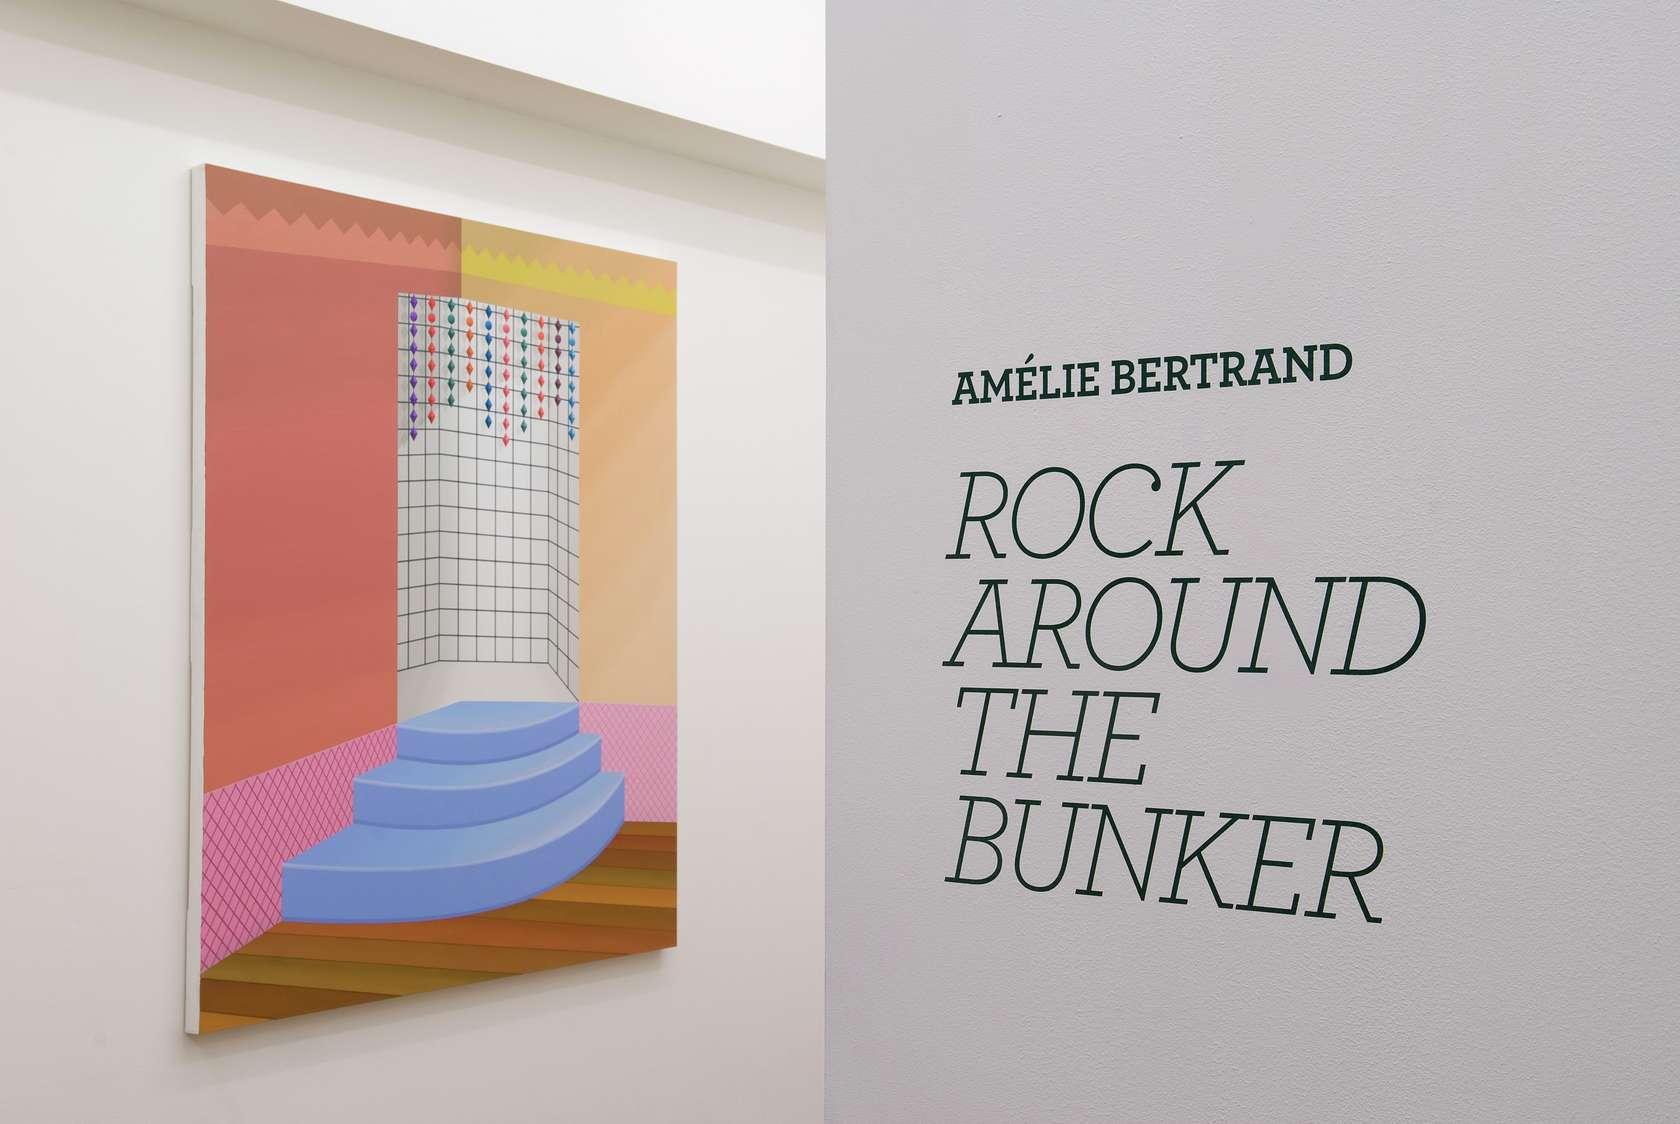 Amélie Bertrand Rock around the bunker Semiose 9 avril  — 22 mai 2010